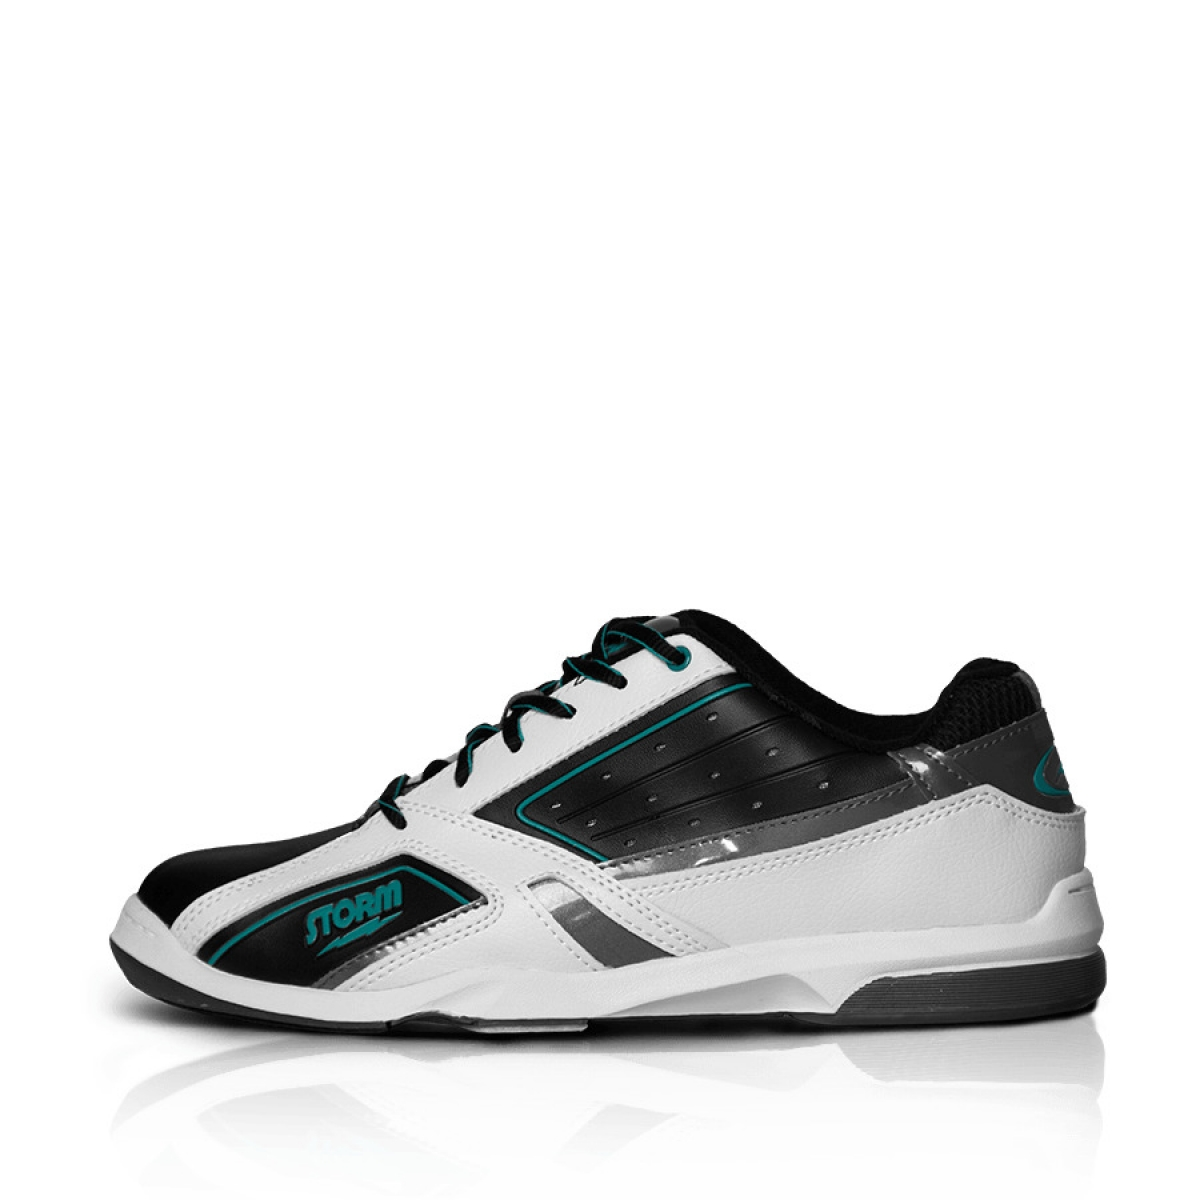 Storm Bowling Shoes Uk